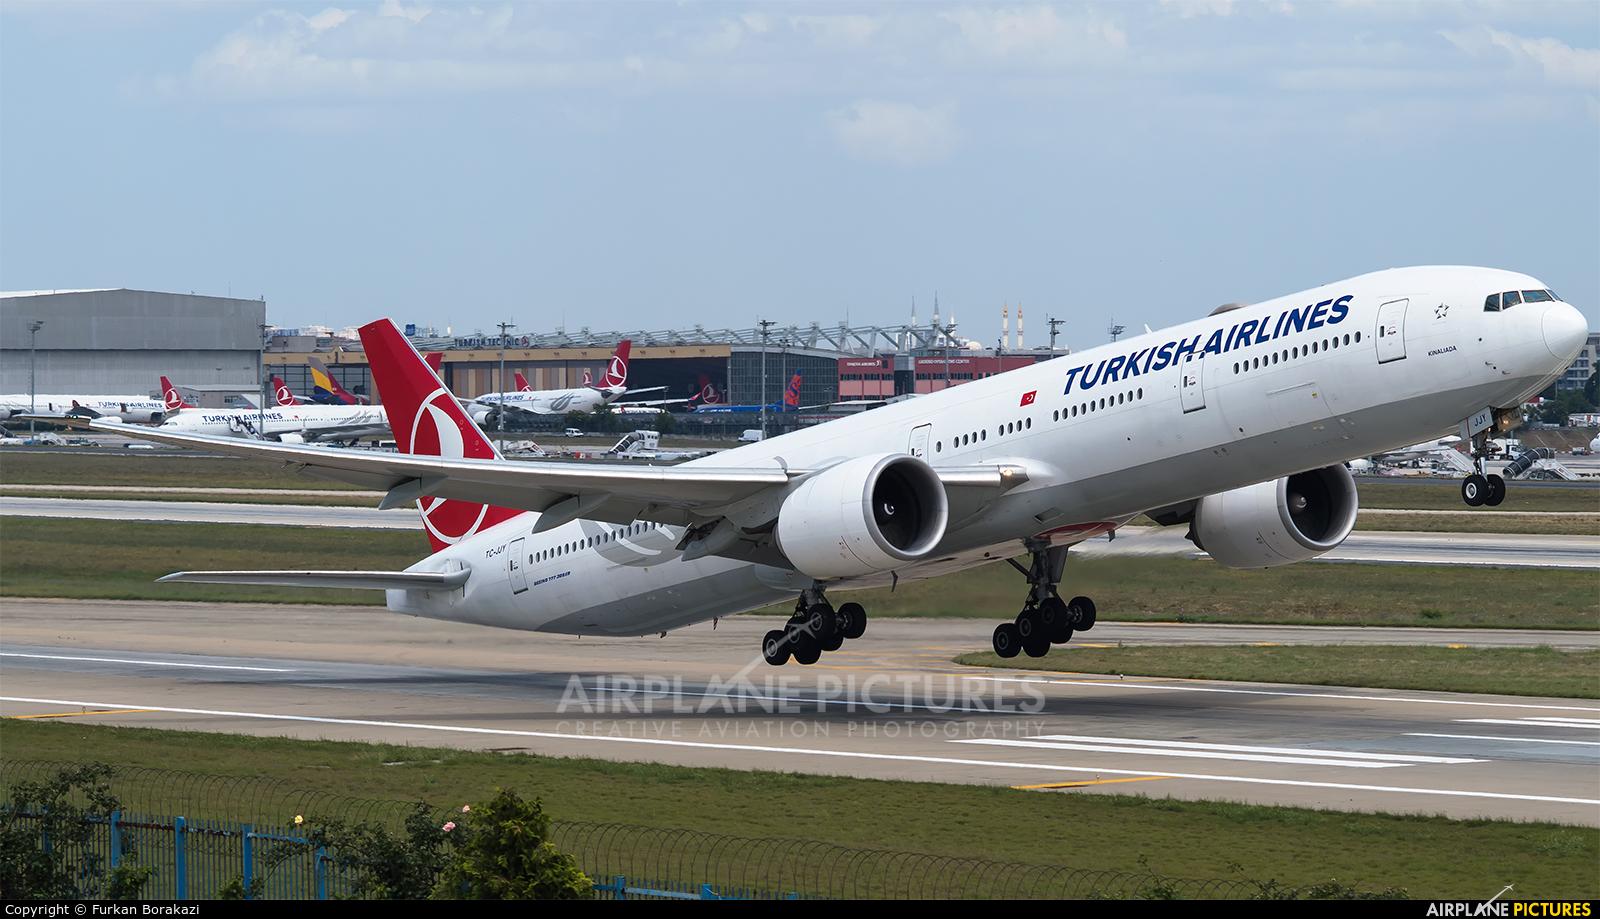 Turkish Airlines TC-JJY aircraft at Istanbul - Ataturk